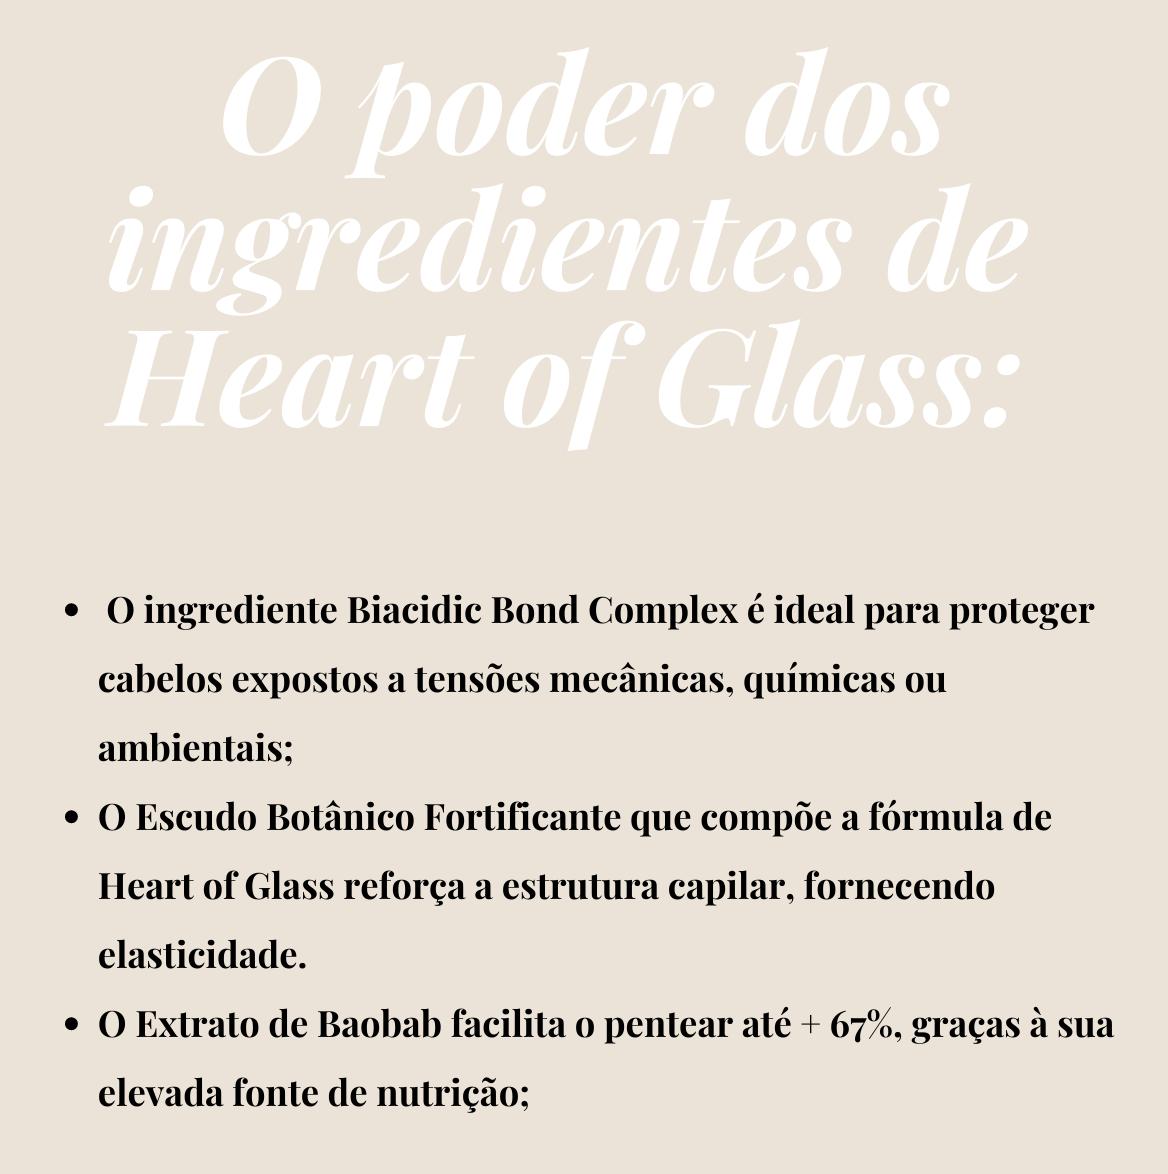 O poder dos ingredientes de Heart of Glass